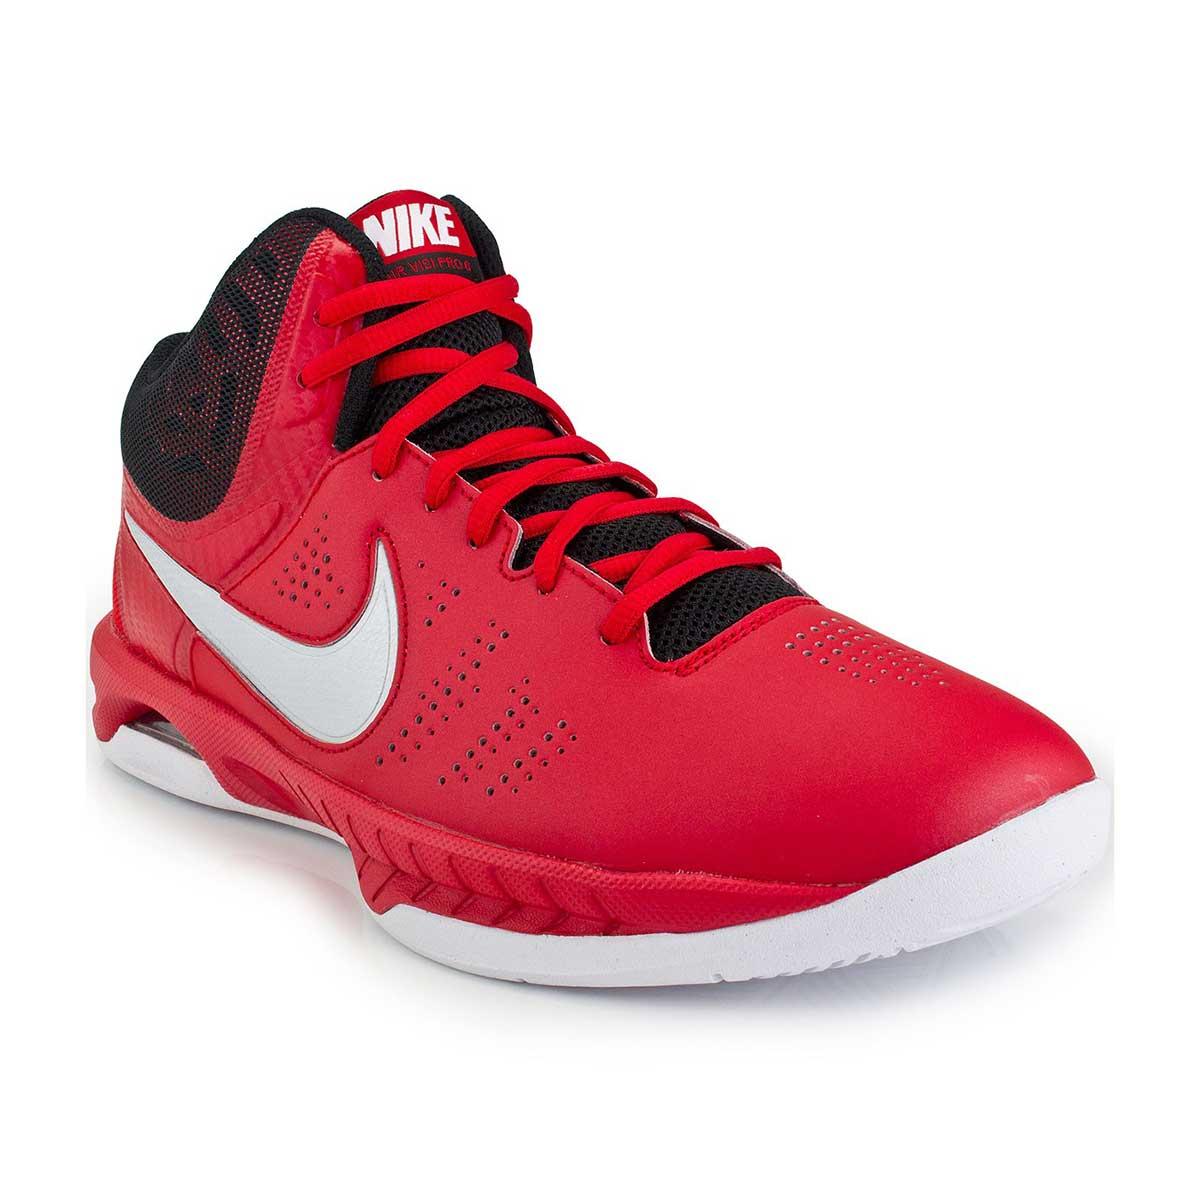 Nike Pro Shoes Nz